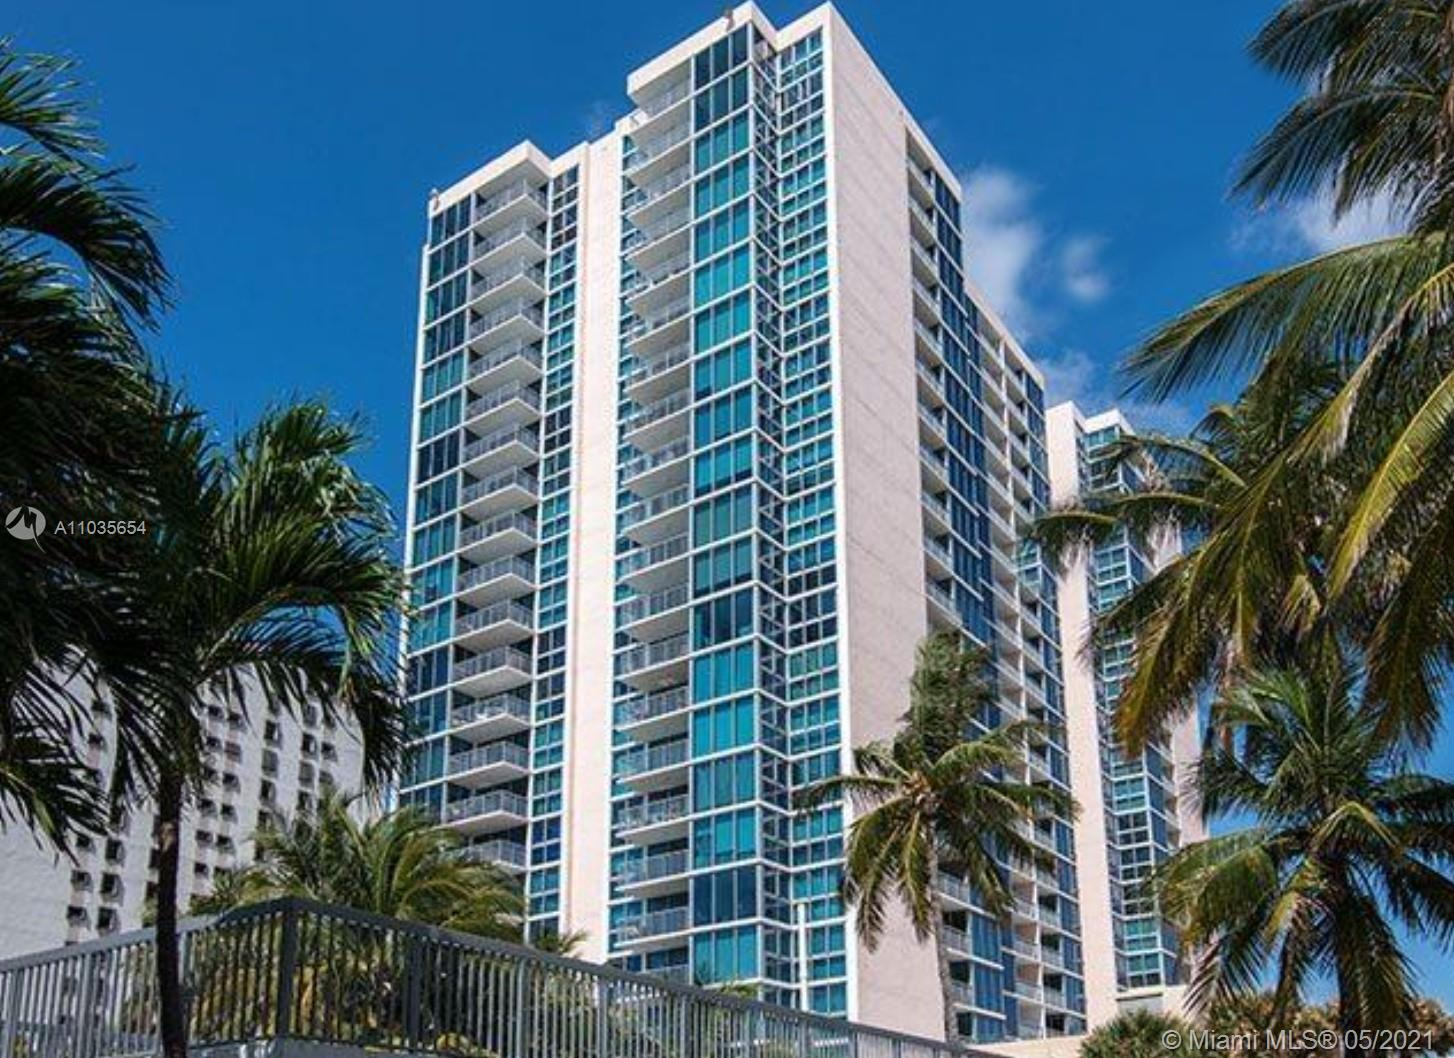 Mirasol Ocean Towers #606 - 18 - photo